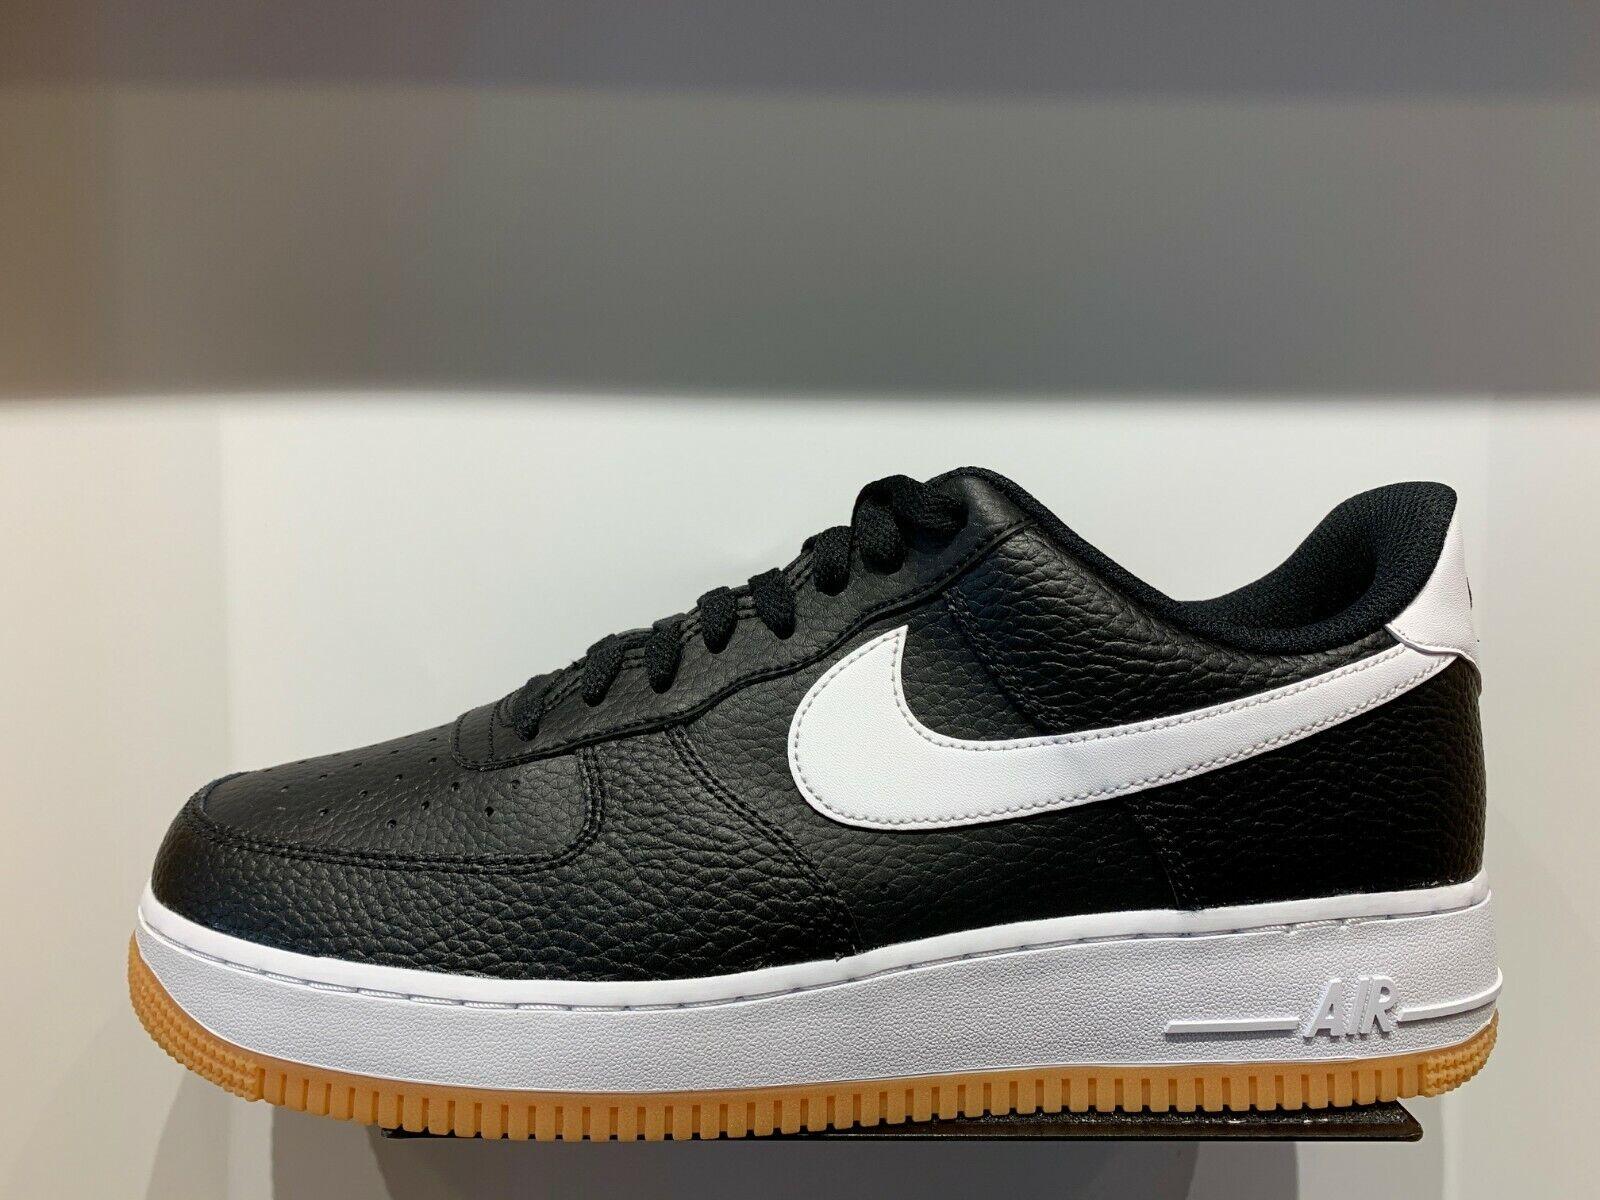 Nike Air Force One 1 Low Black White Gum Bottom Men GS Size 4Y 13 AF1